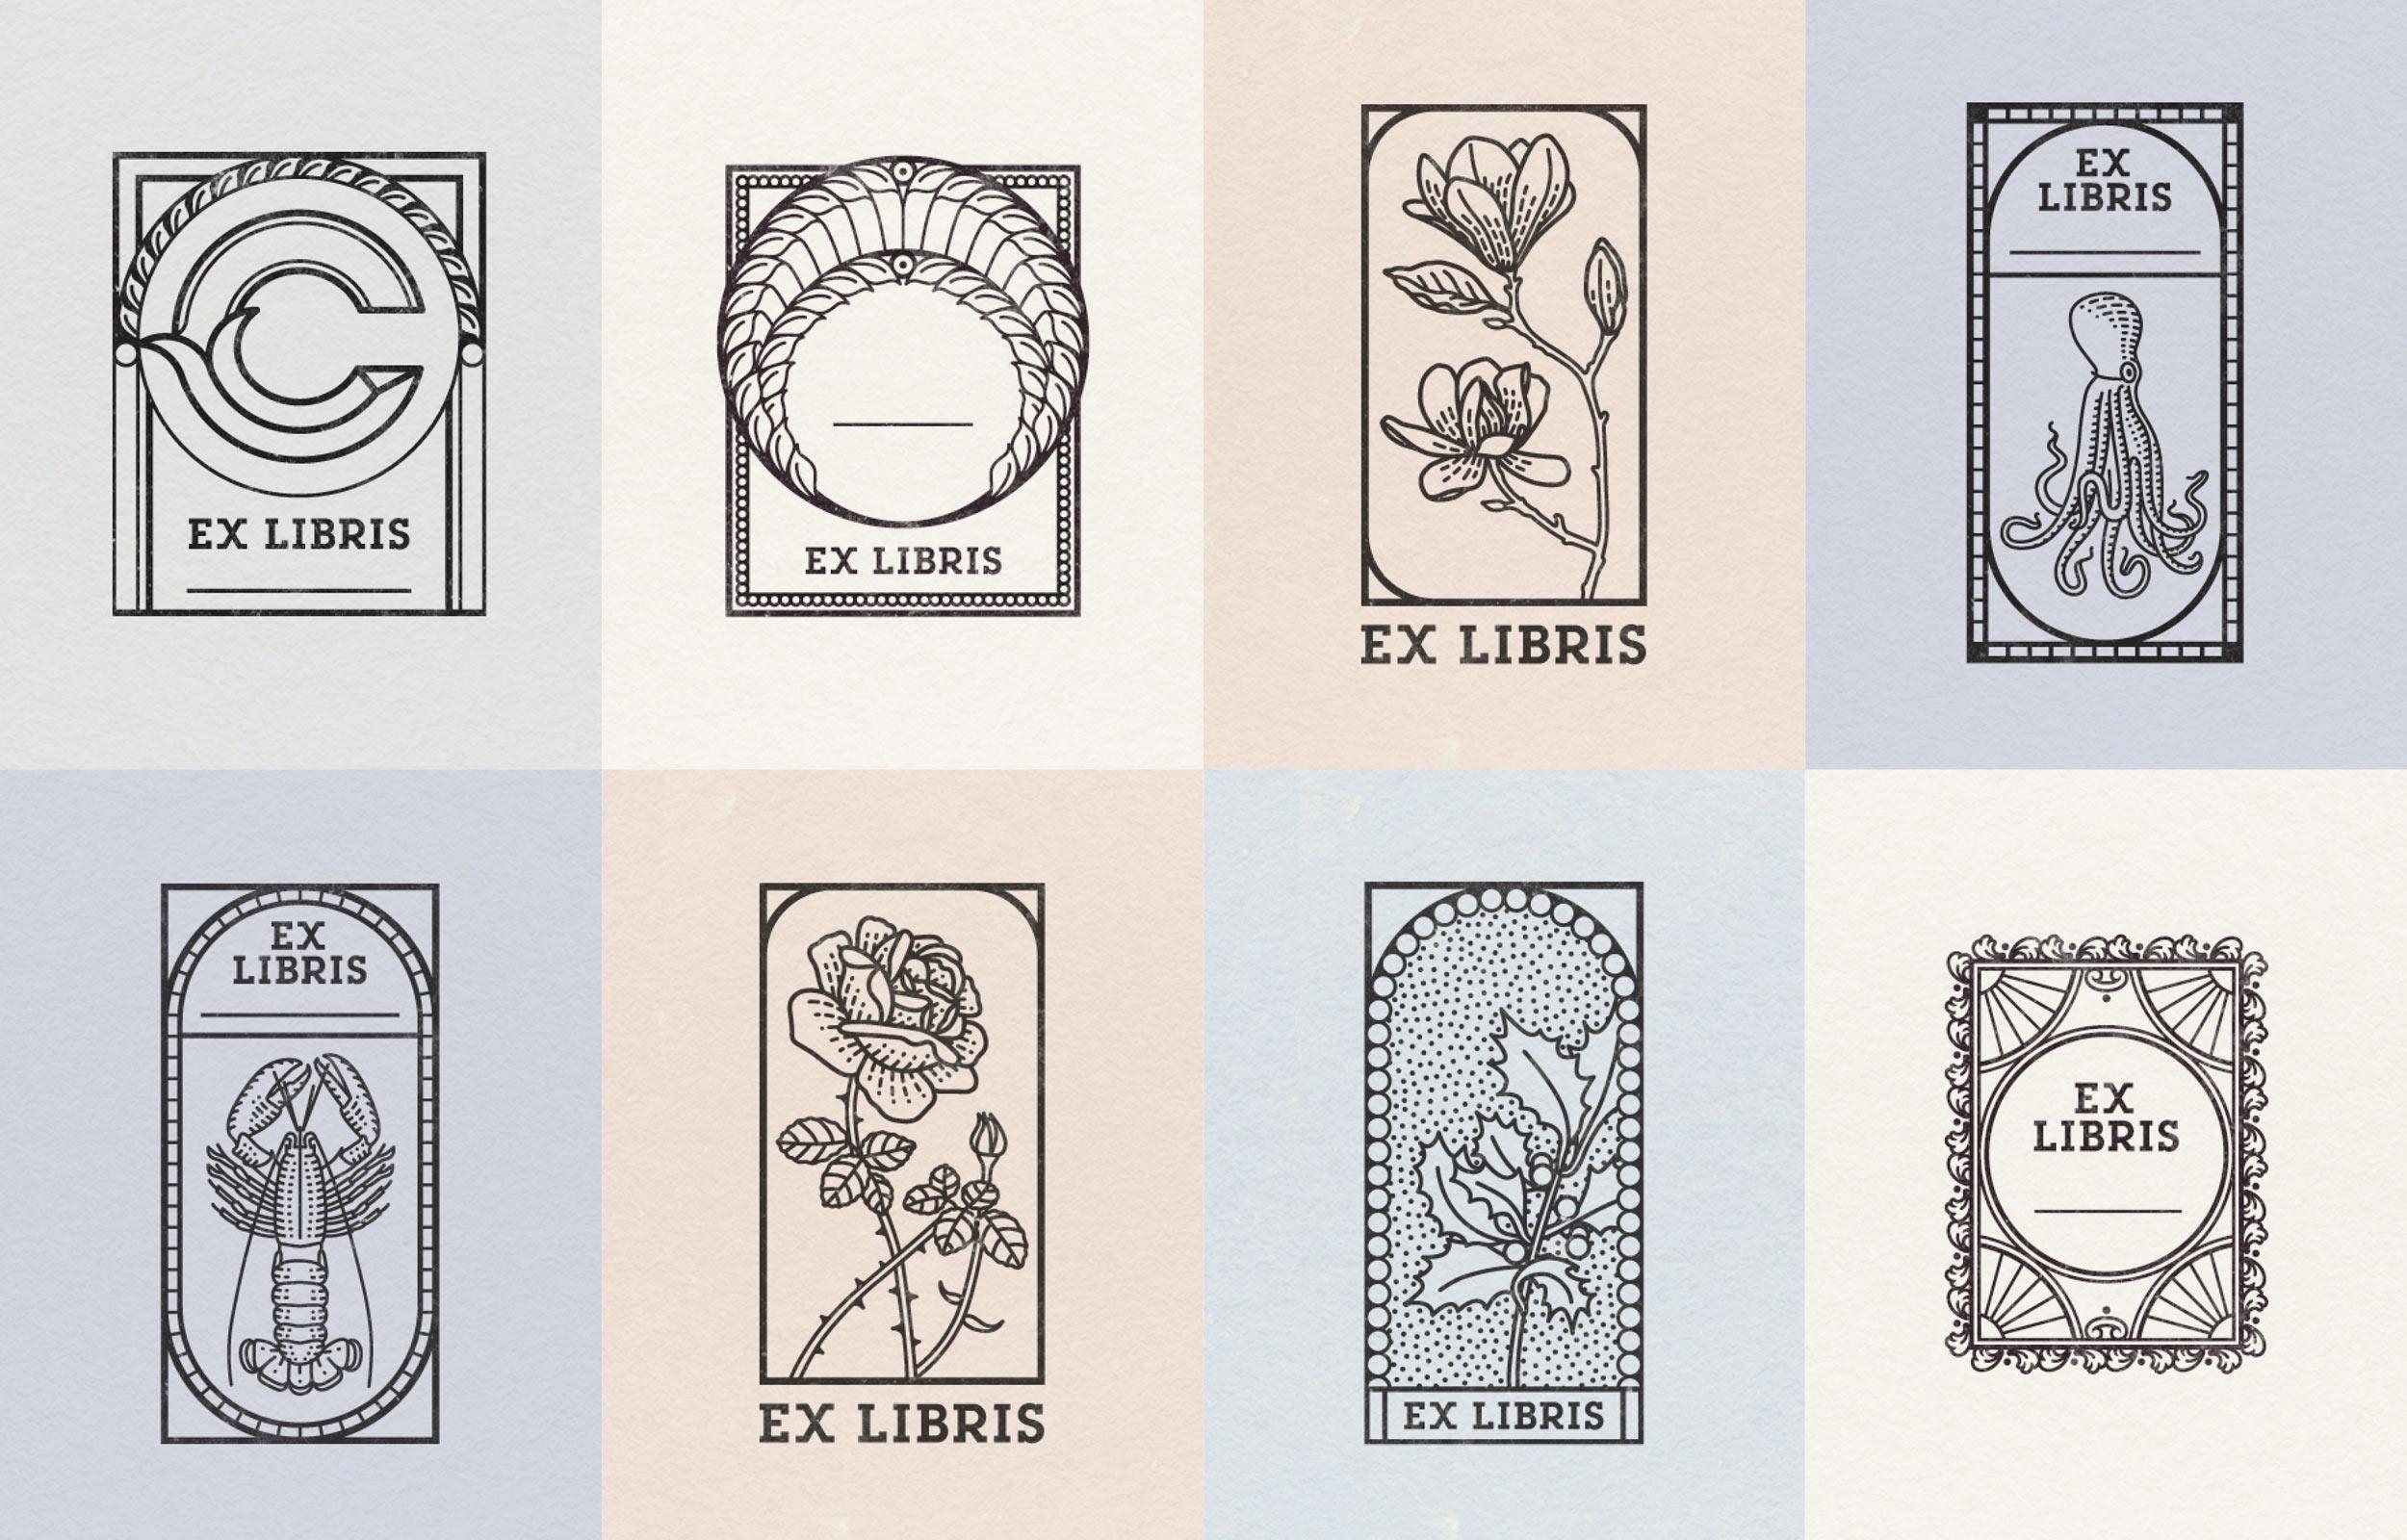 Clara De Lorenzi - Ex Libris Room